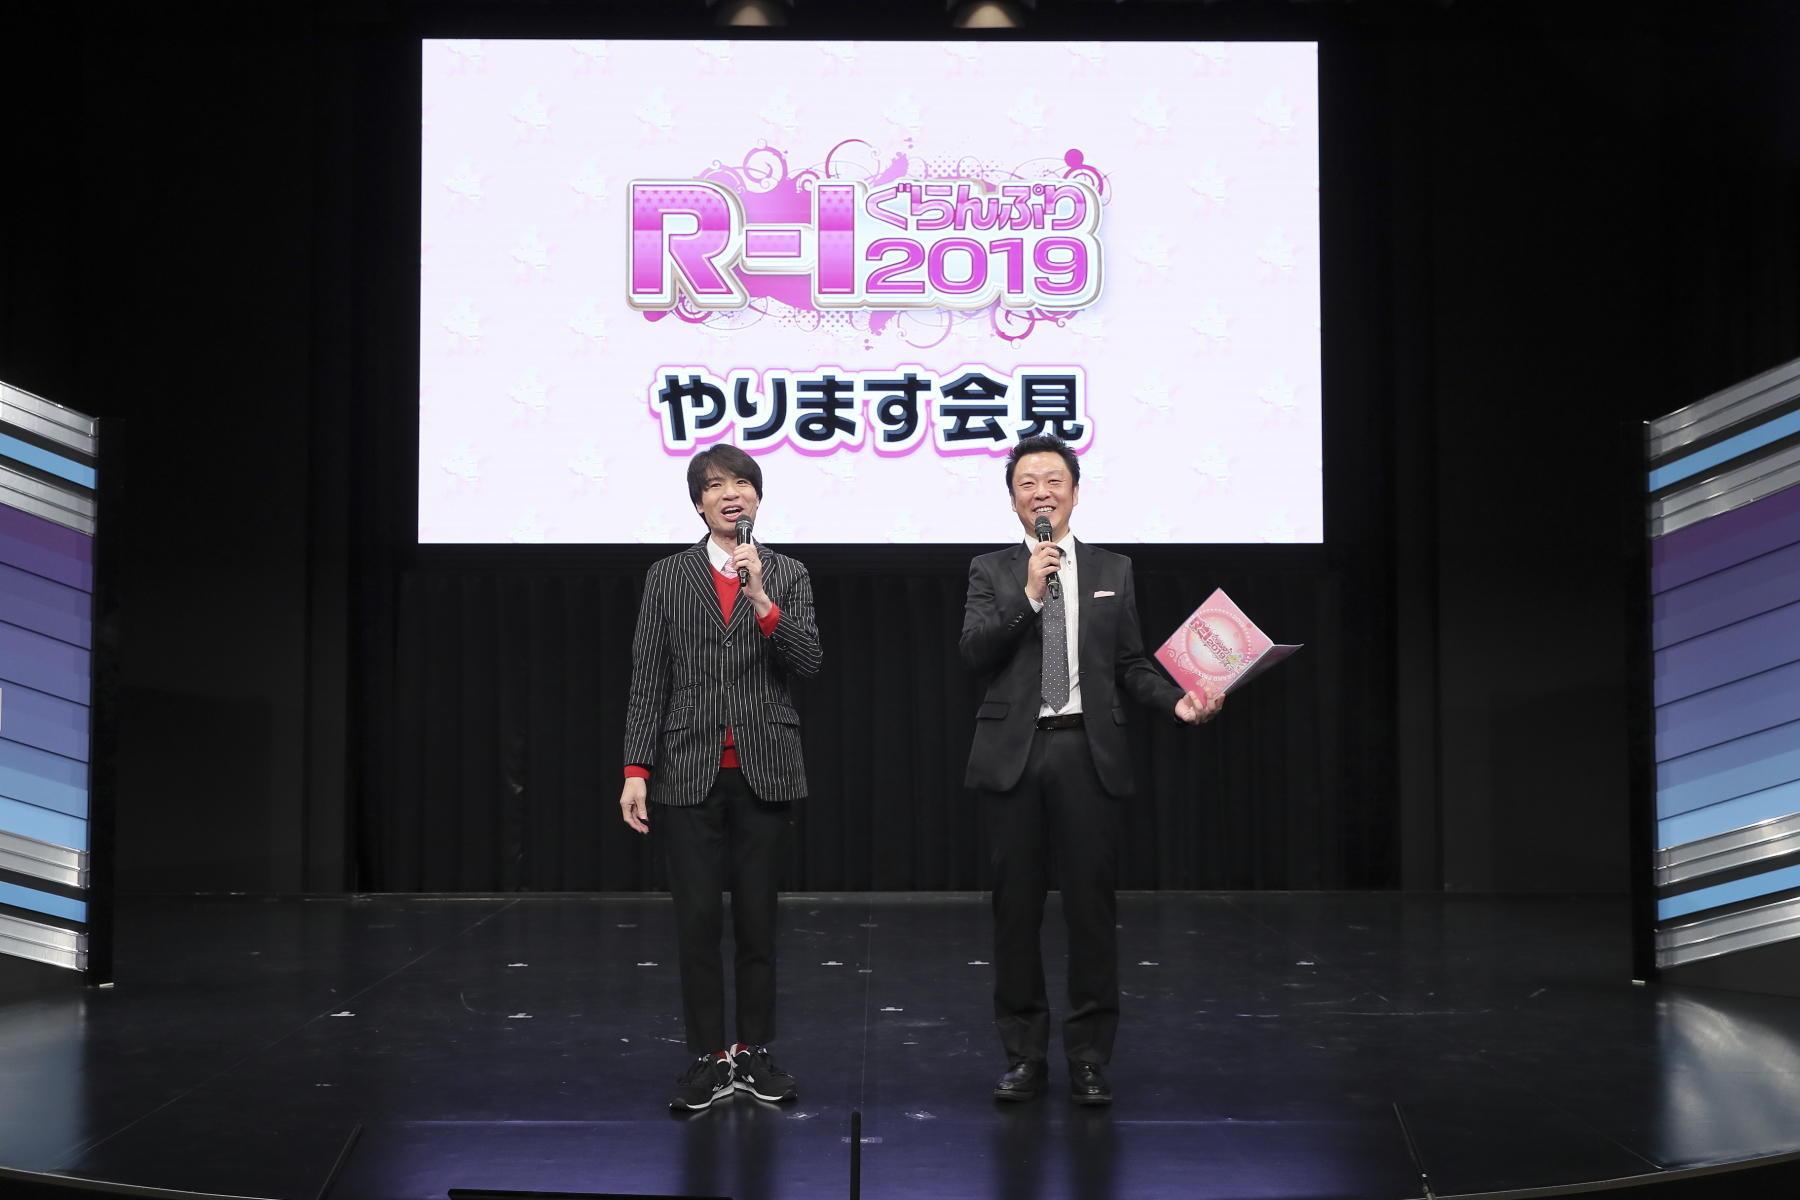 http://news.yoshimoto.co.jp/20181130142814-259f7665c007057c2b5d98f17557a64649dfbae7.jpg